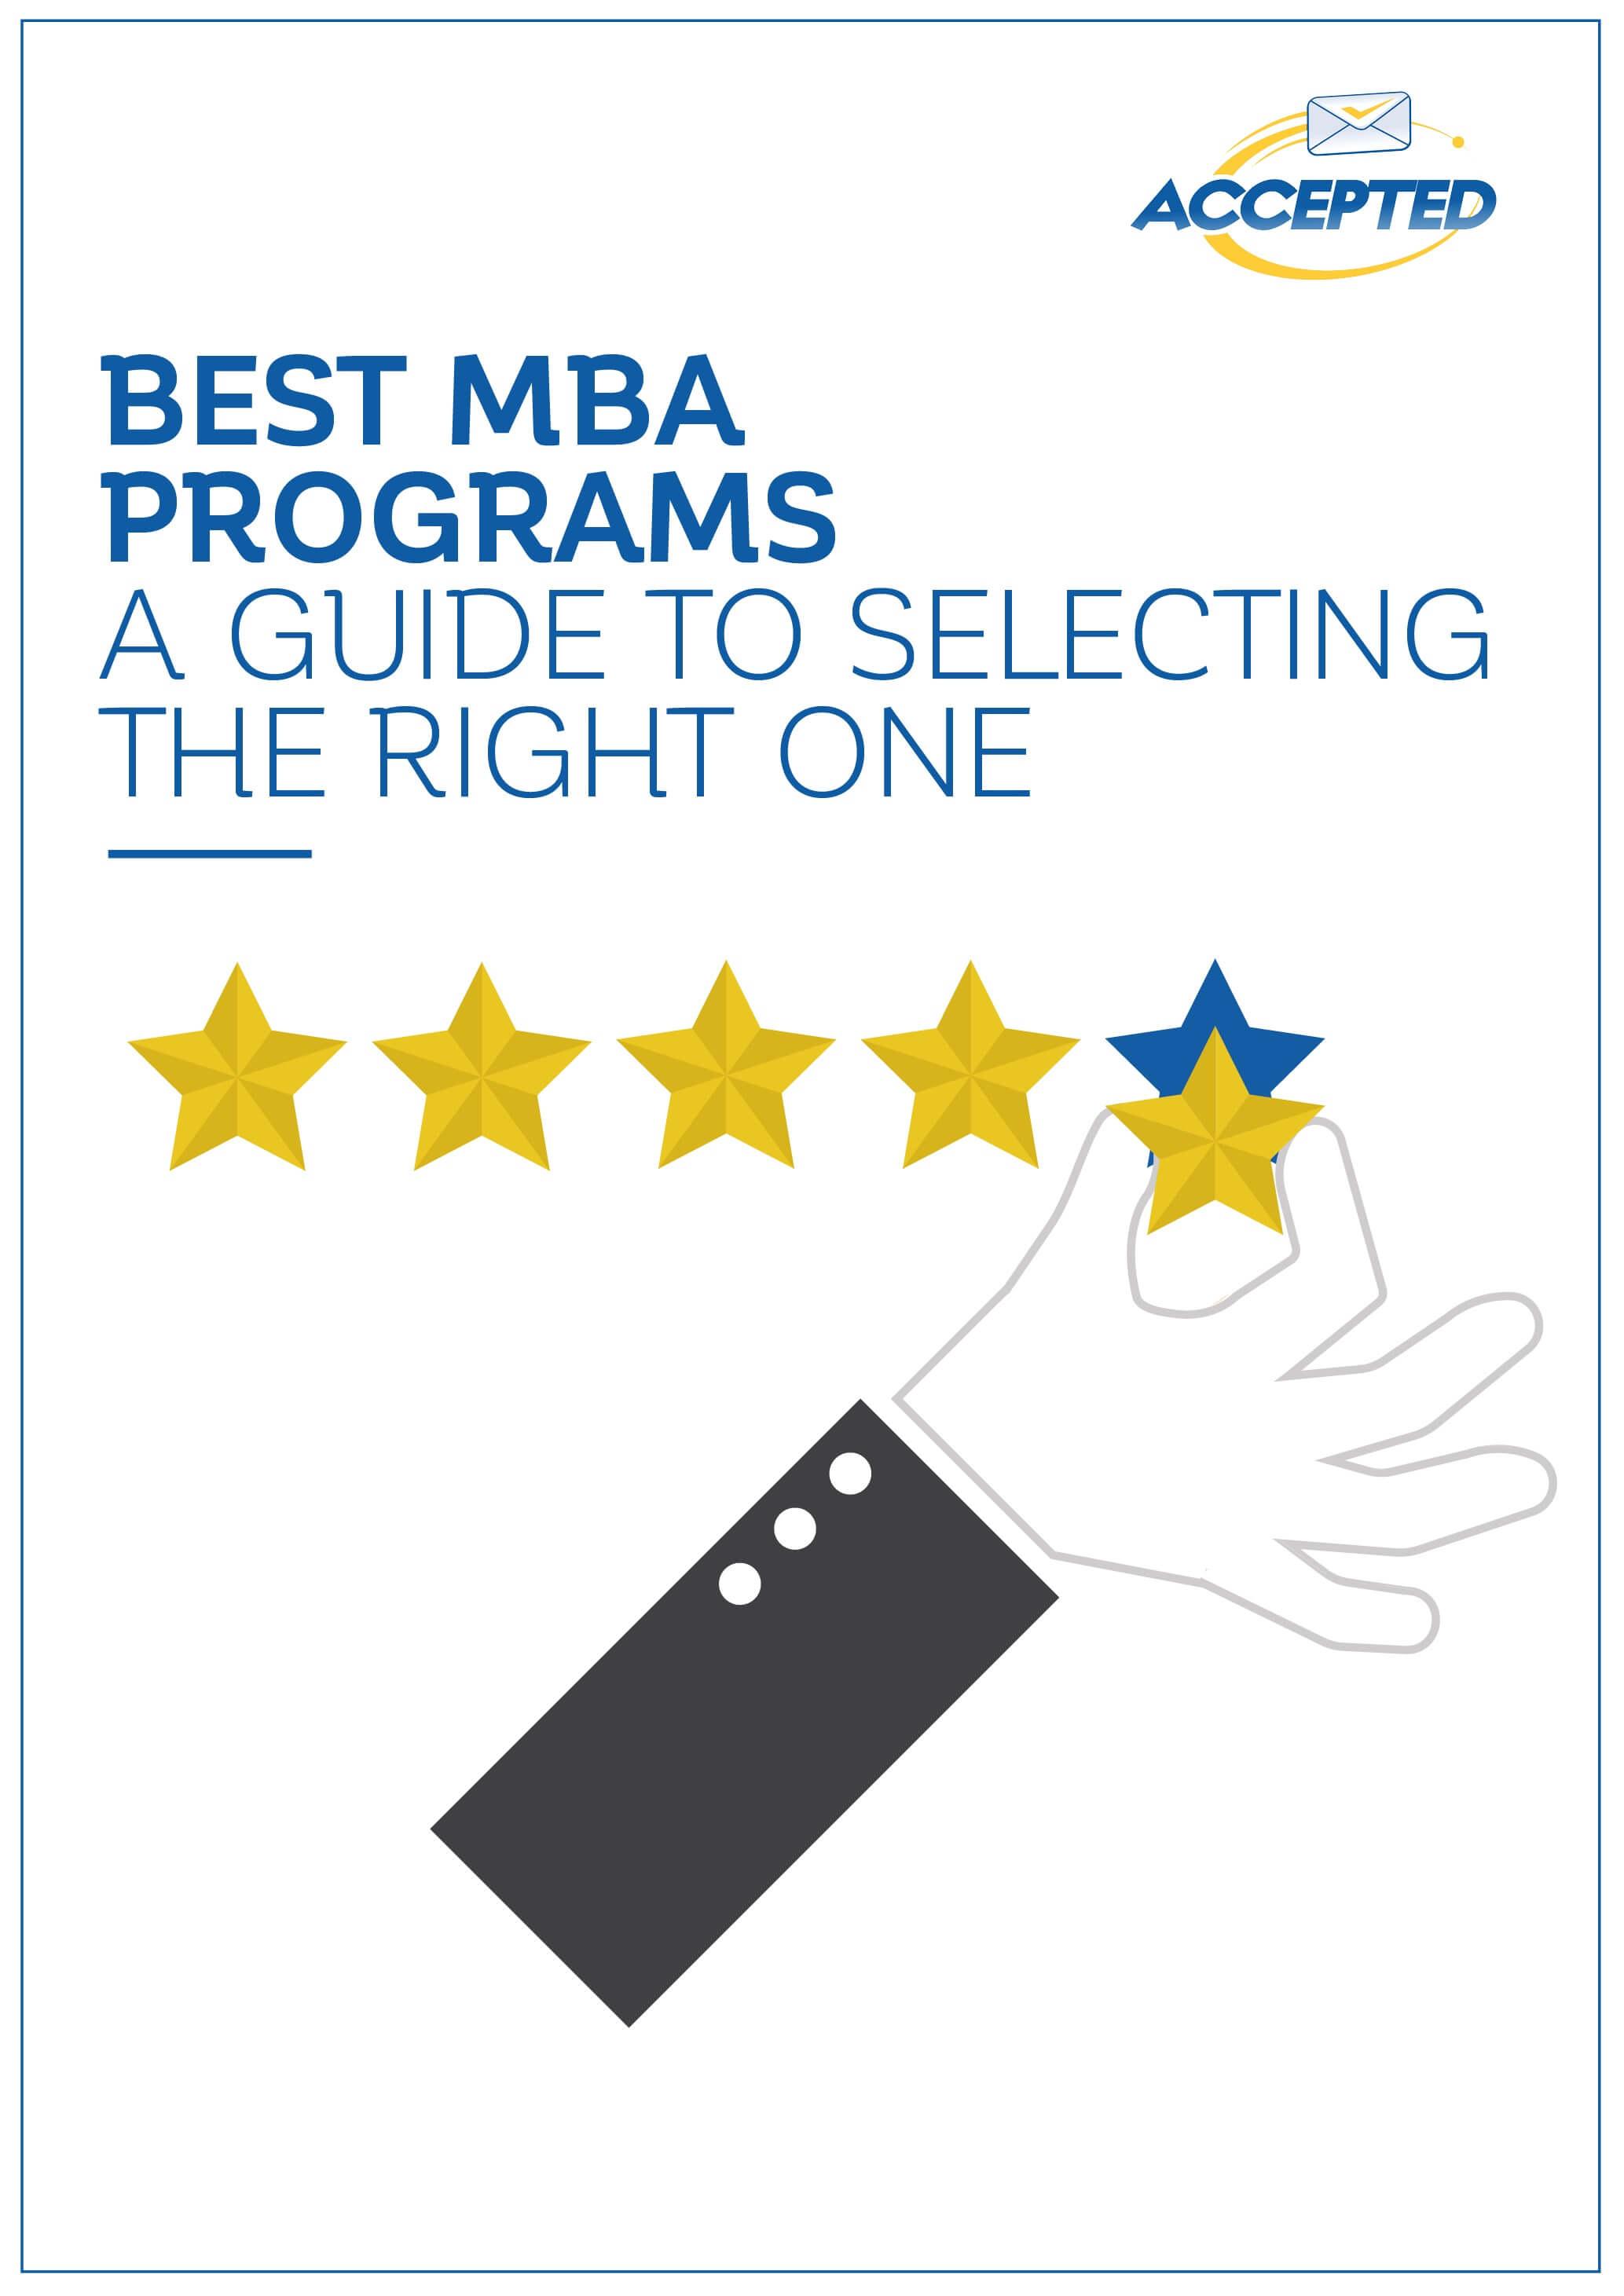 Best_MBA_Programs.jpg